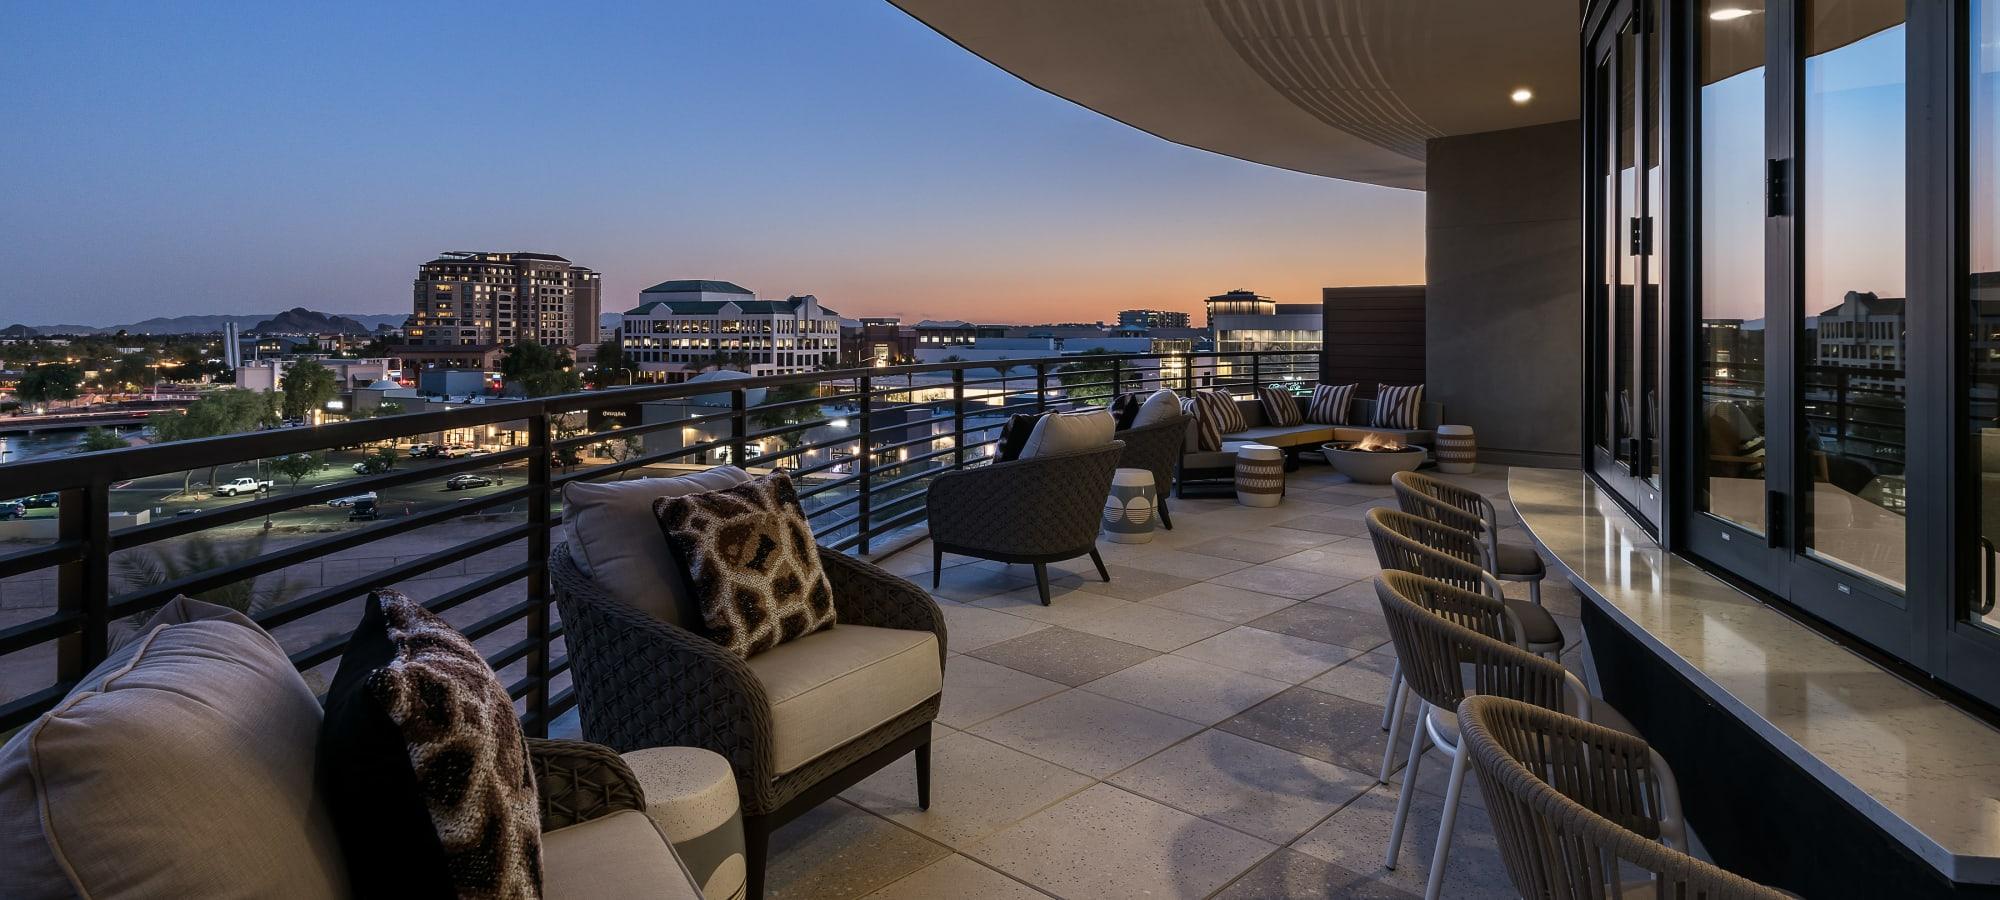 Sky lounge area overlooking Scottsdale at Gramercy Scottsdale in Scottsdale, Arizona